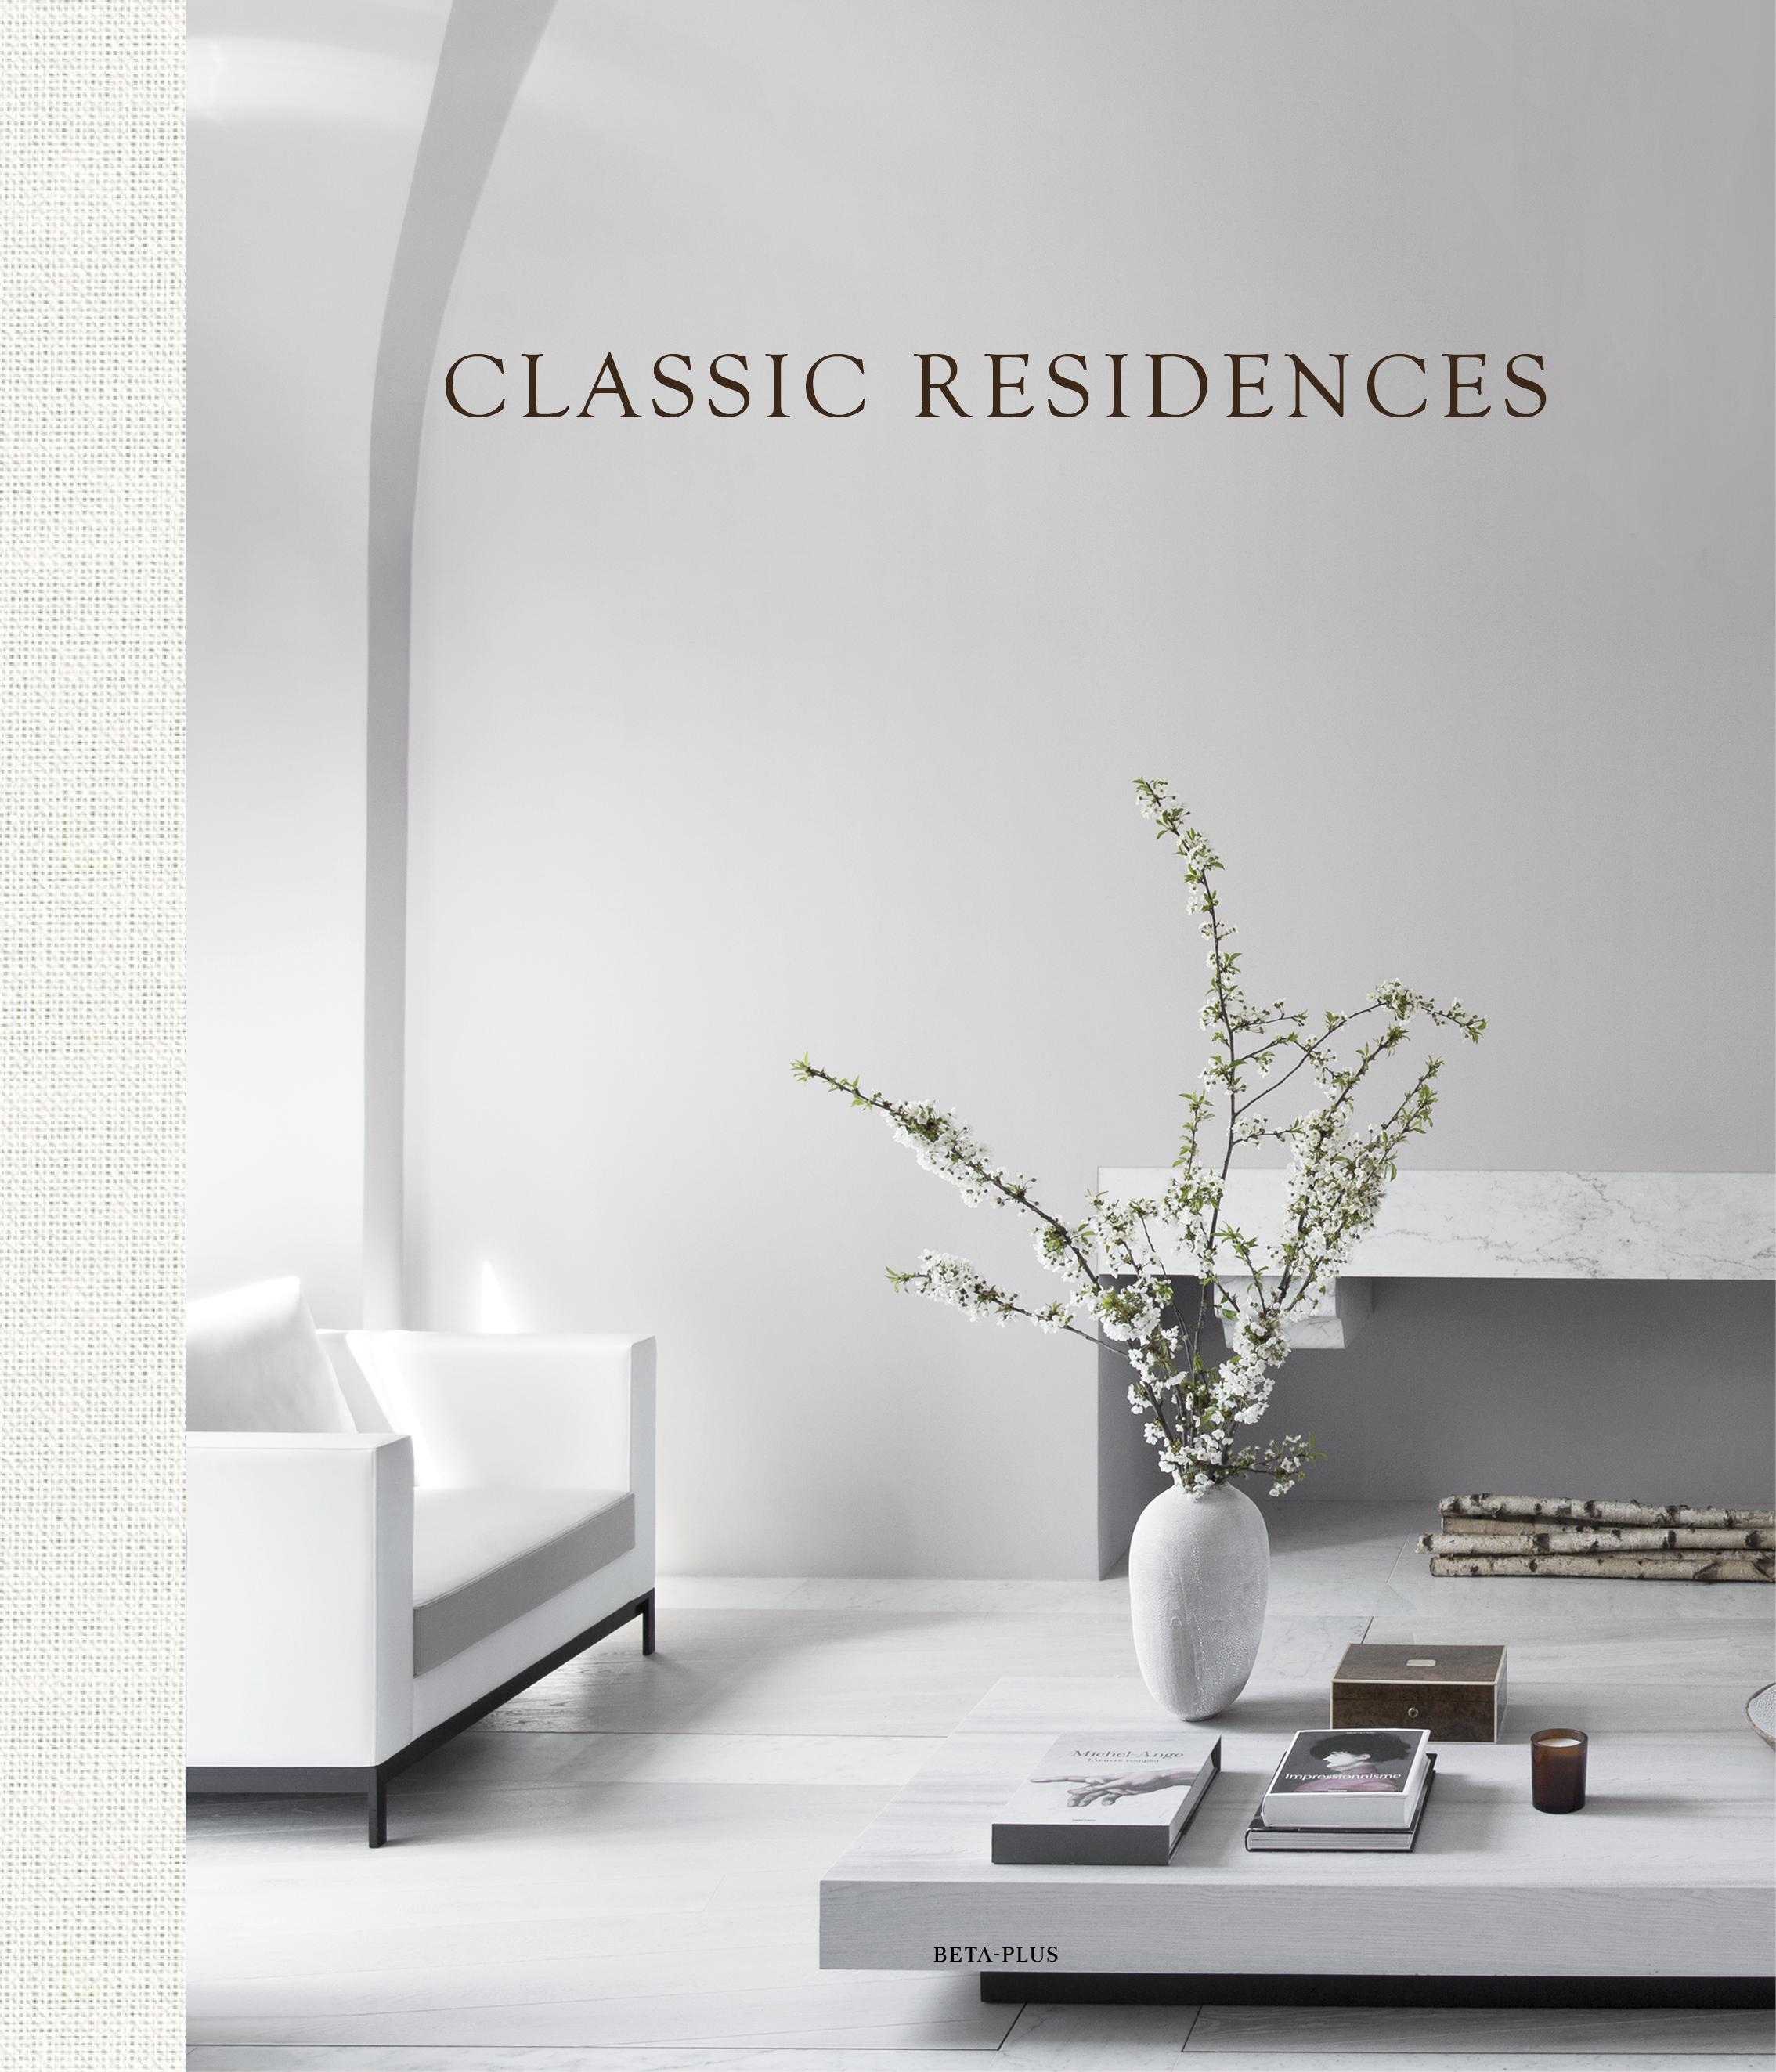 Beta Plus Classic Residences